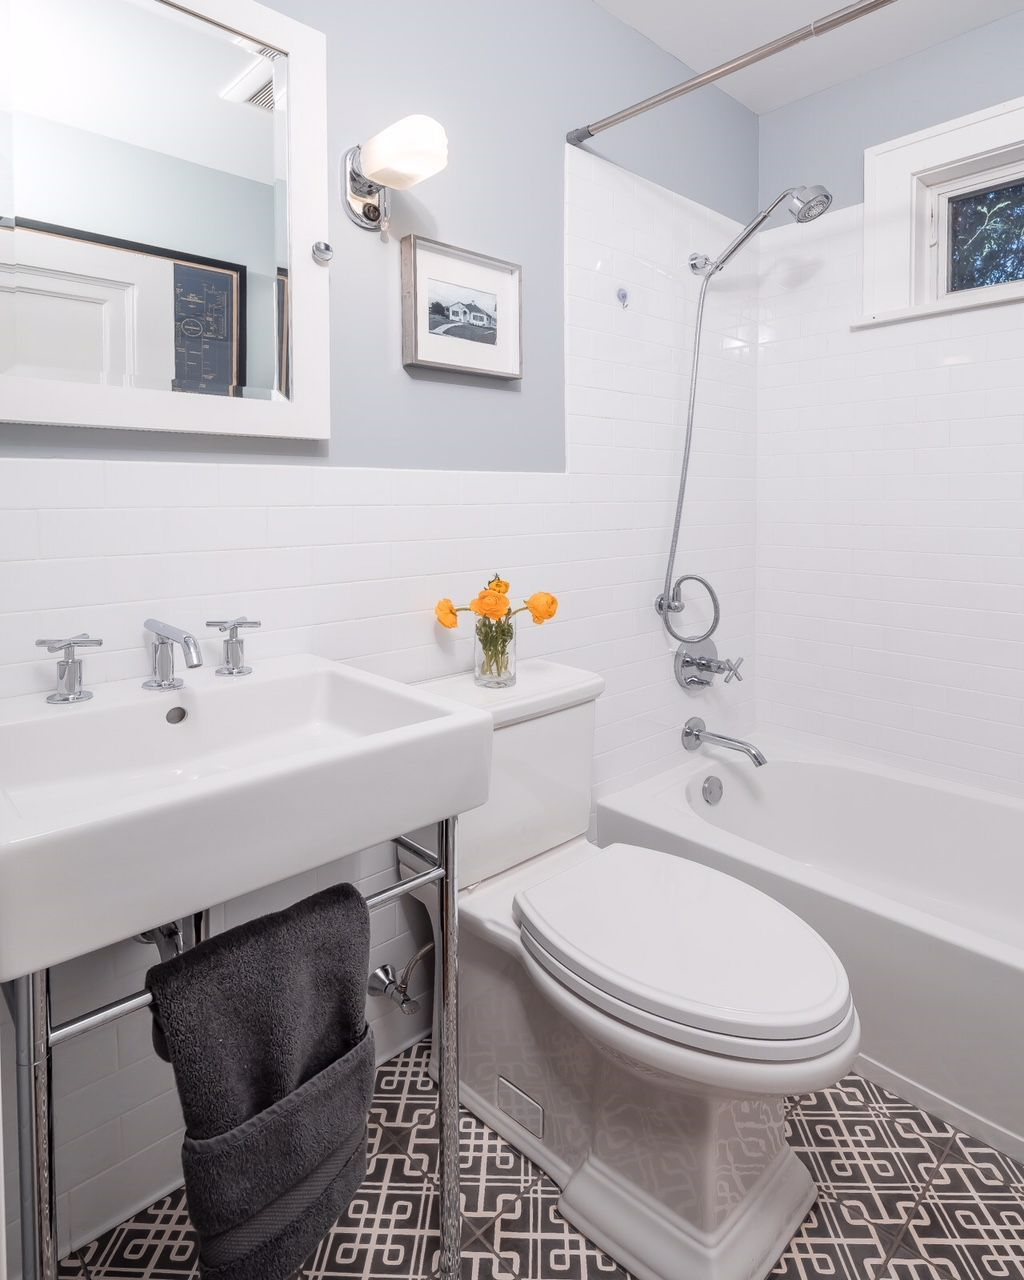 9 invincible cool ideas bathroom remodel vintage dressers bathroom rh in pinterest com